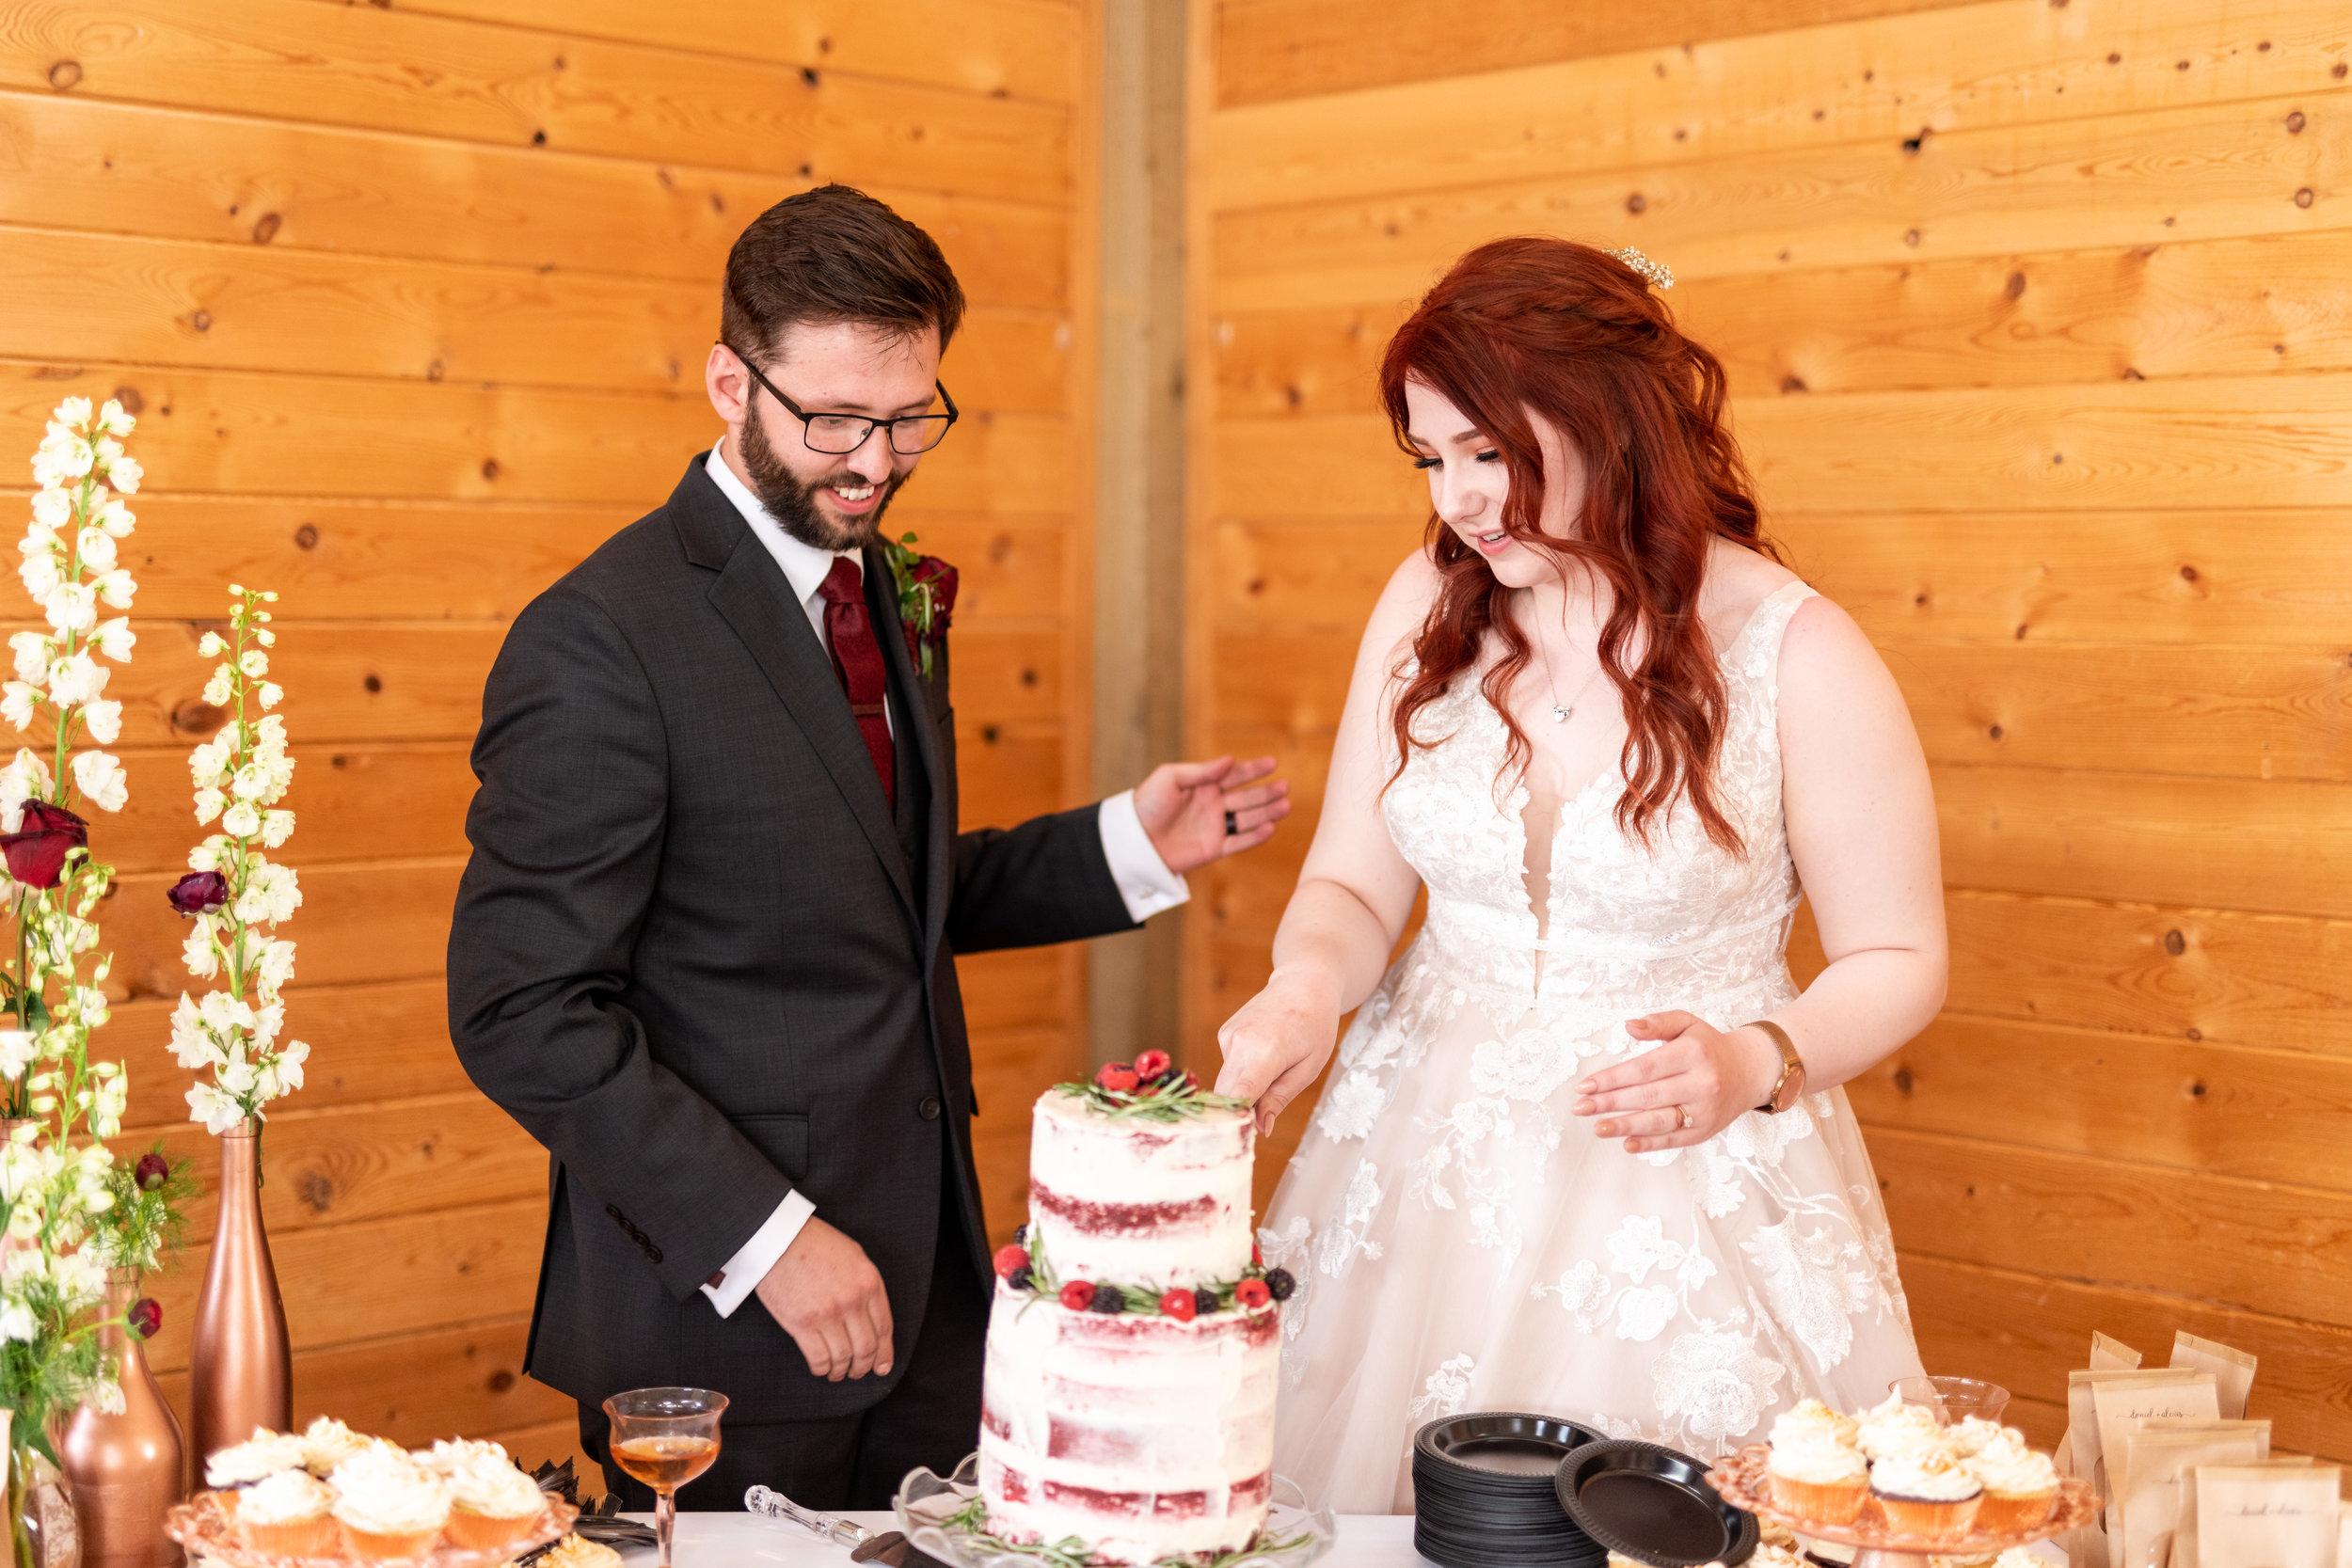 Spokane green bluff wedding dress bride cake cutting